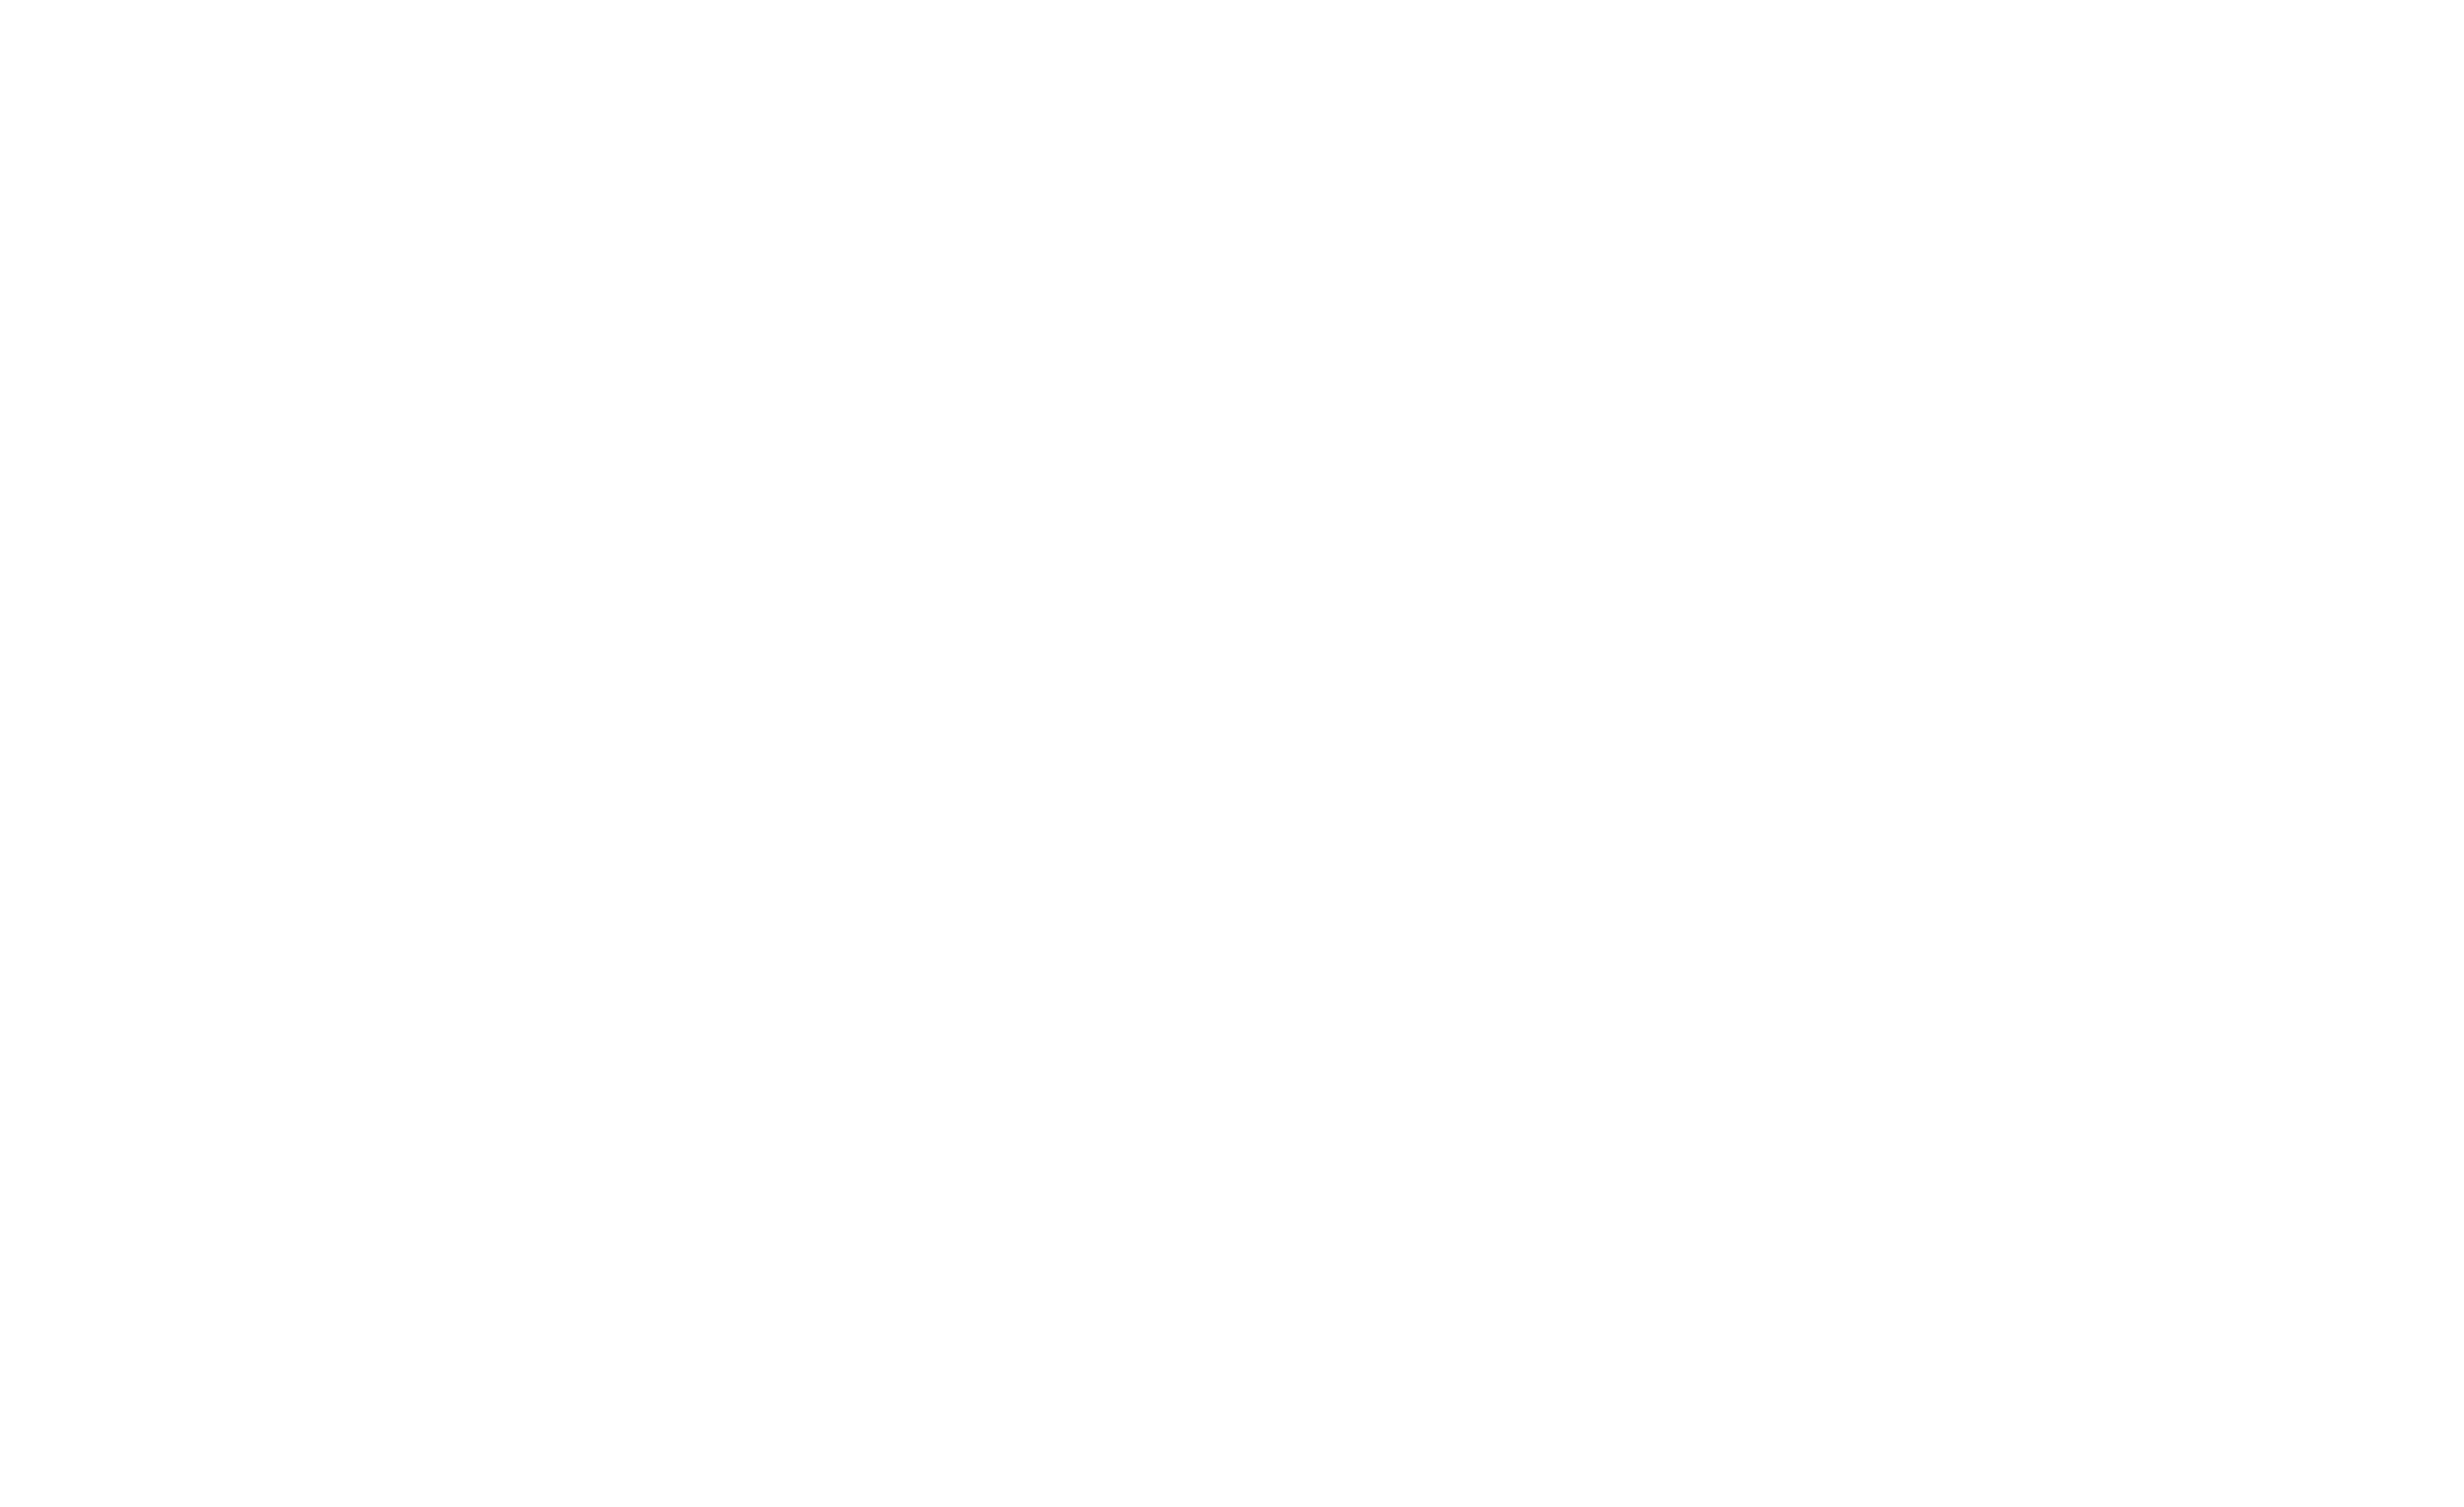 Sparkles png files by. Sparkle clipart magical sparkle